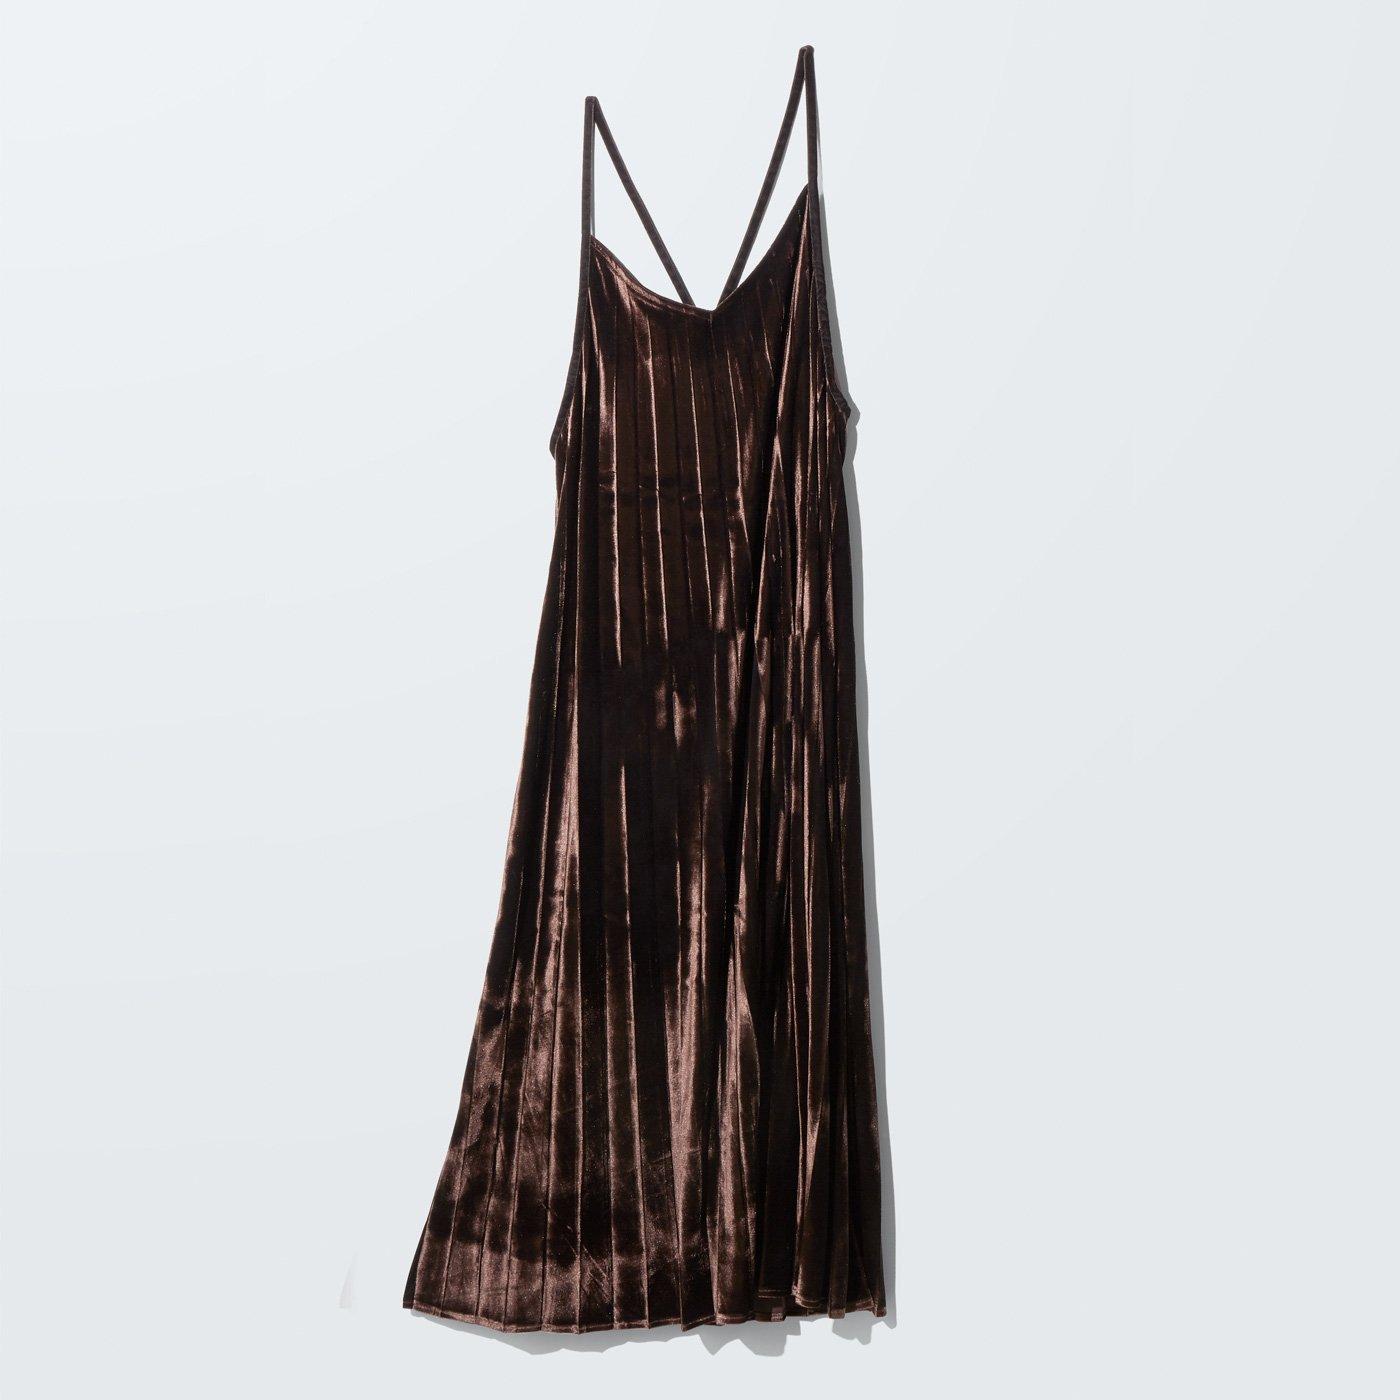 MEDE19F ベロアプリーツキャミドレス〈ダークブラウン〉